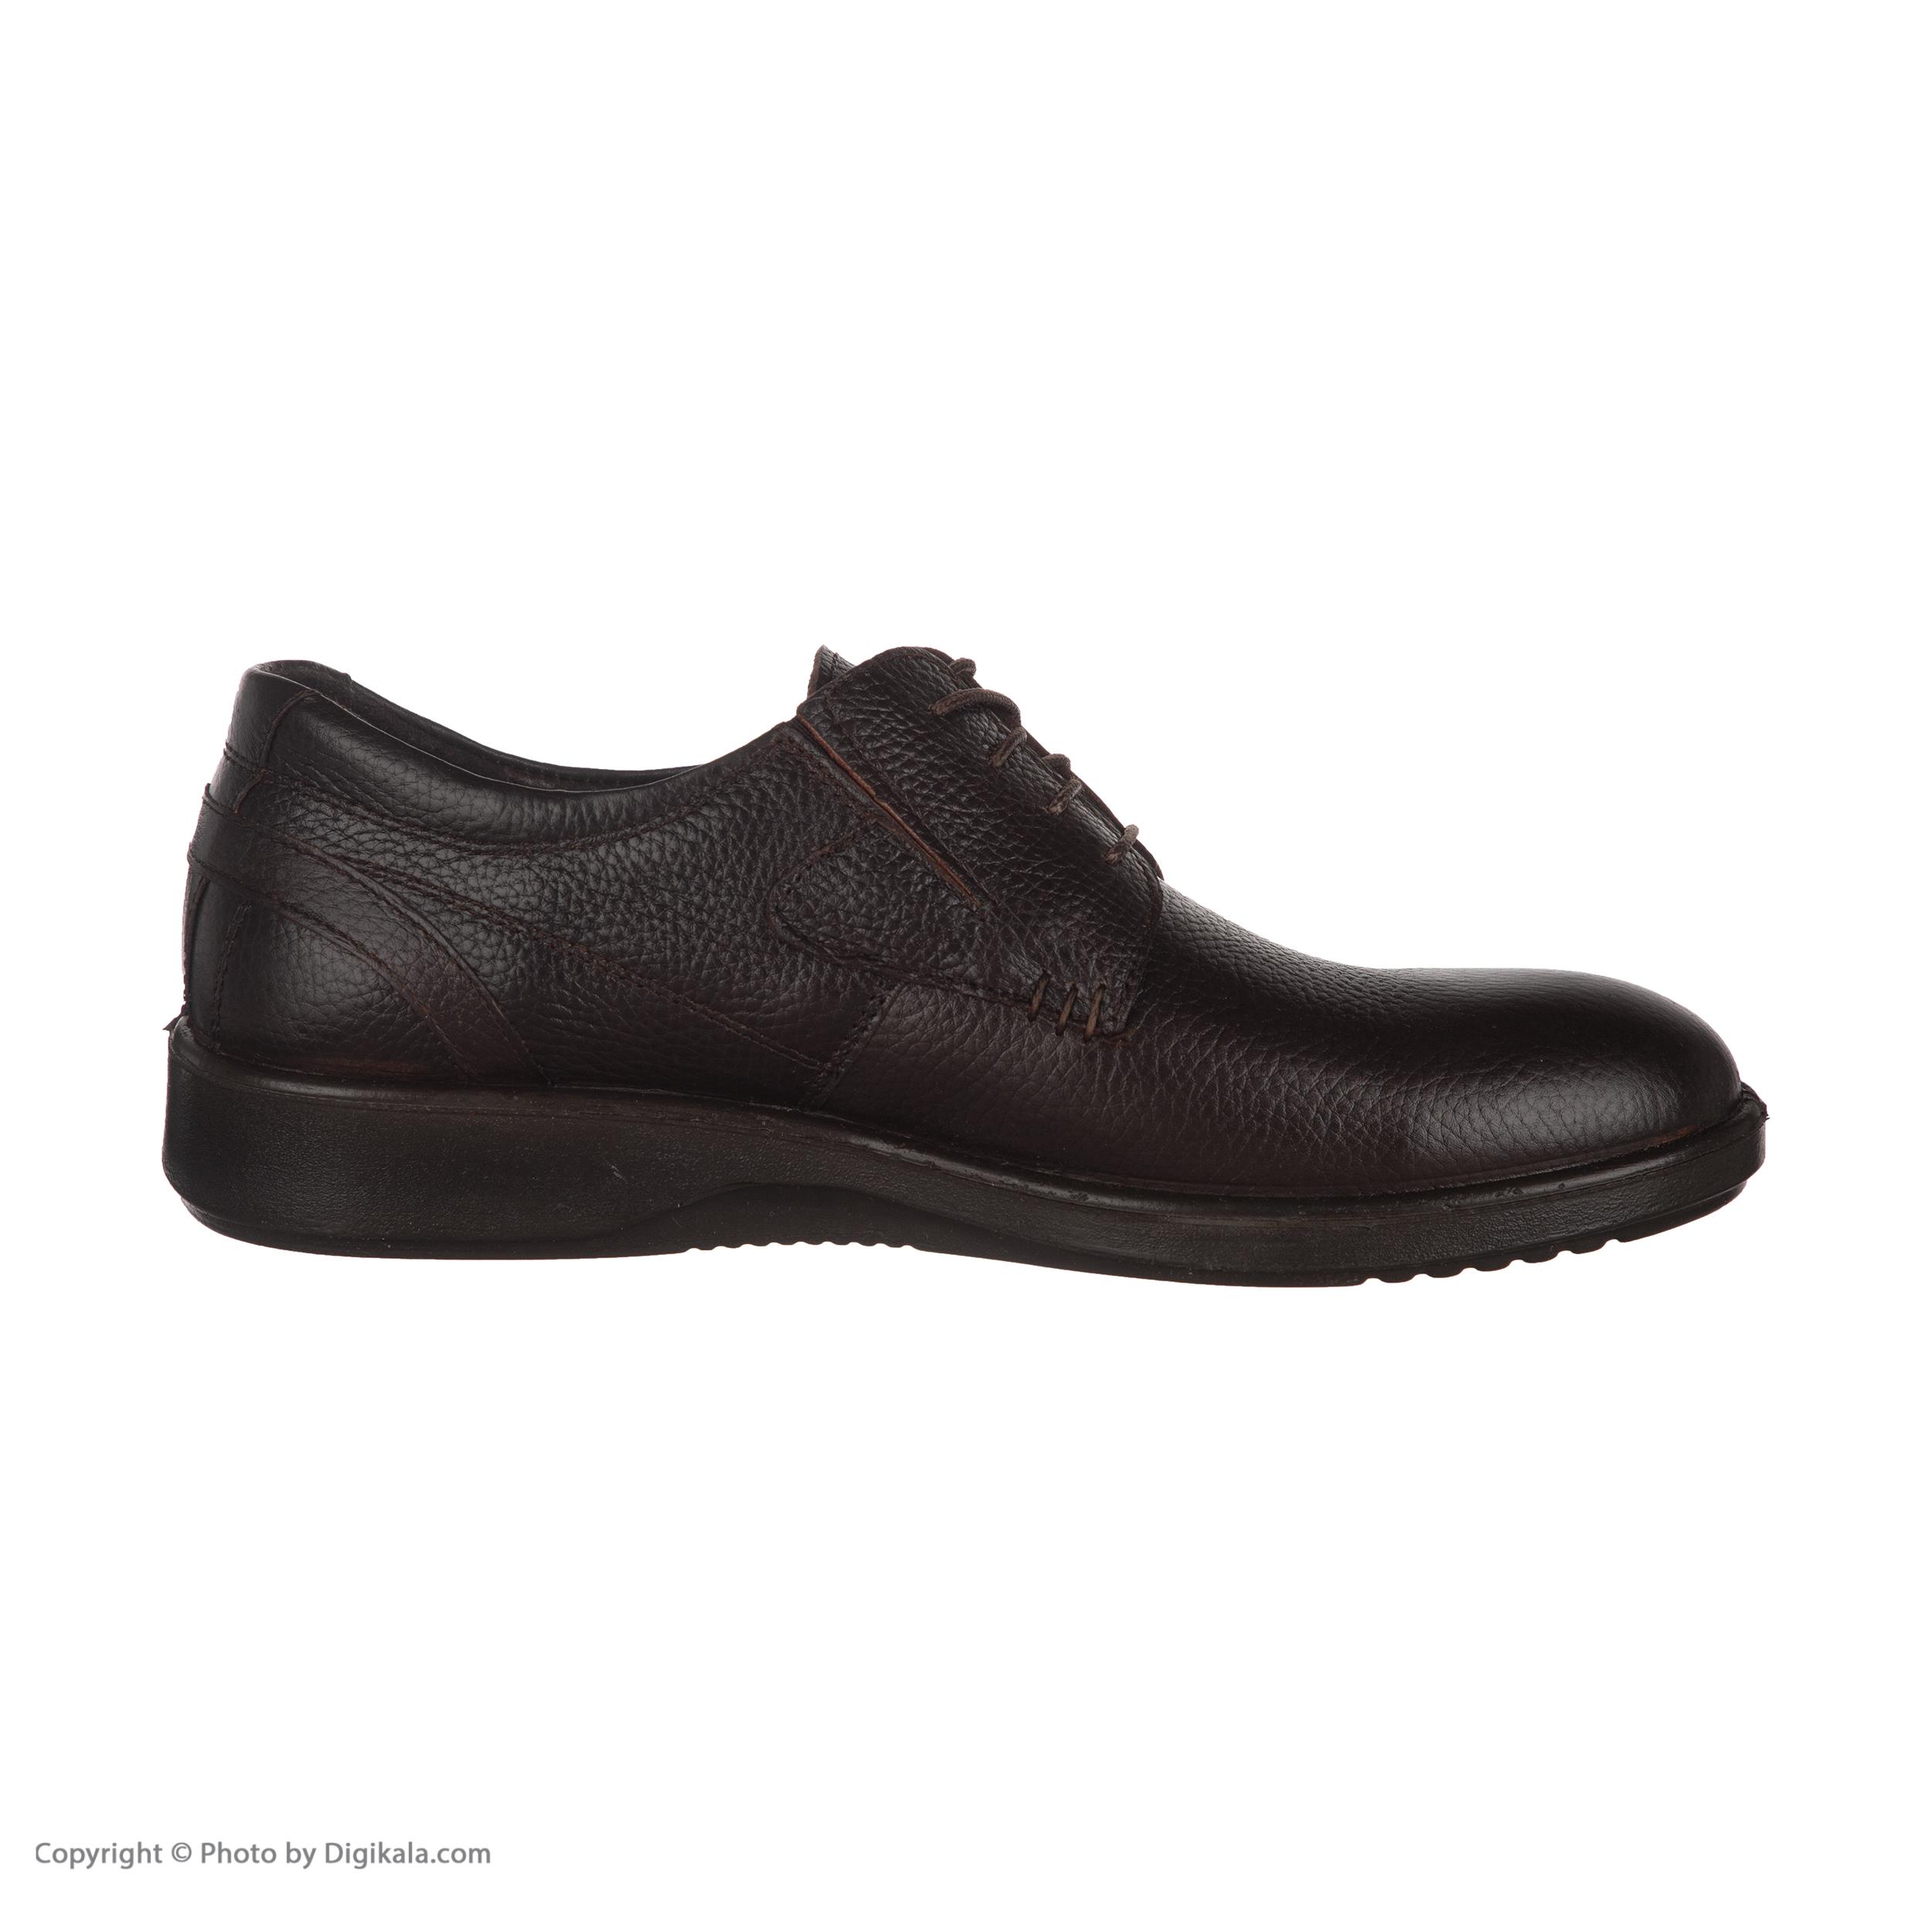 کفش روزمره مردانه آذر پلاس مدل 9438B503104 -  - 7